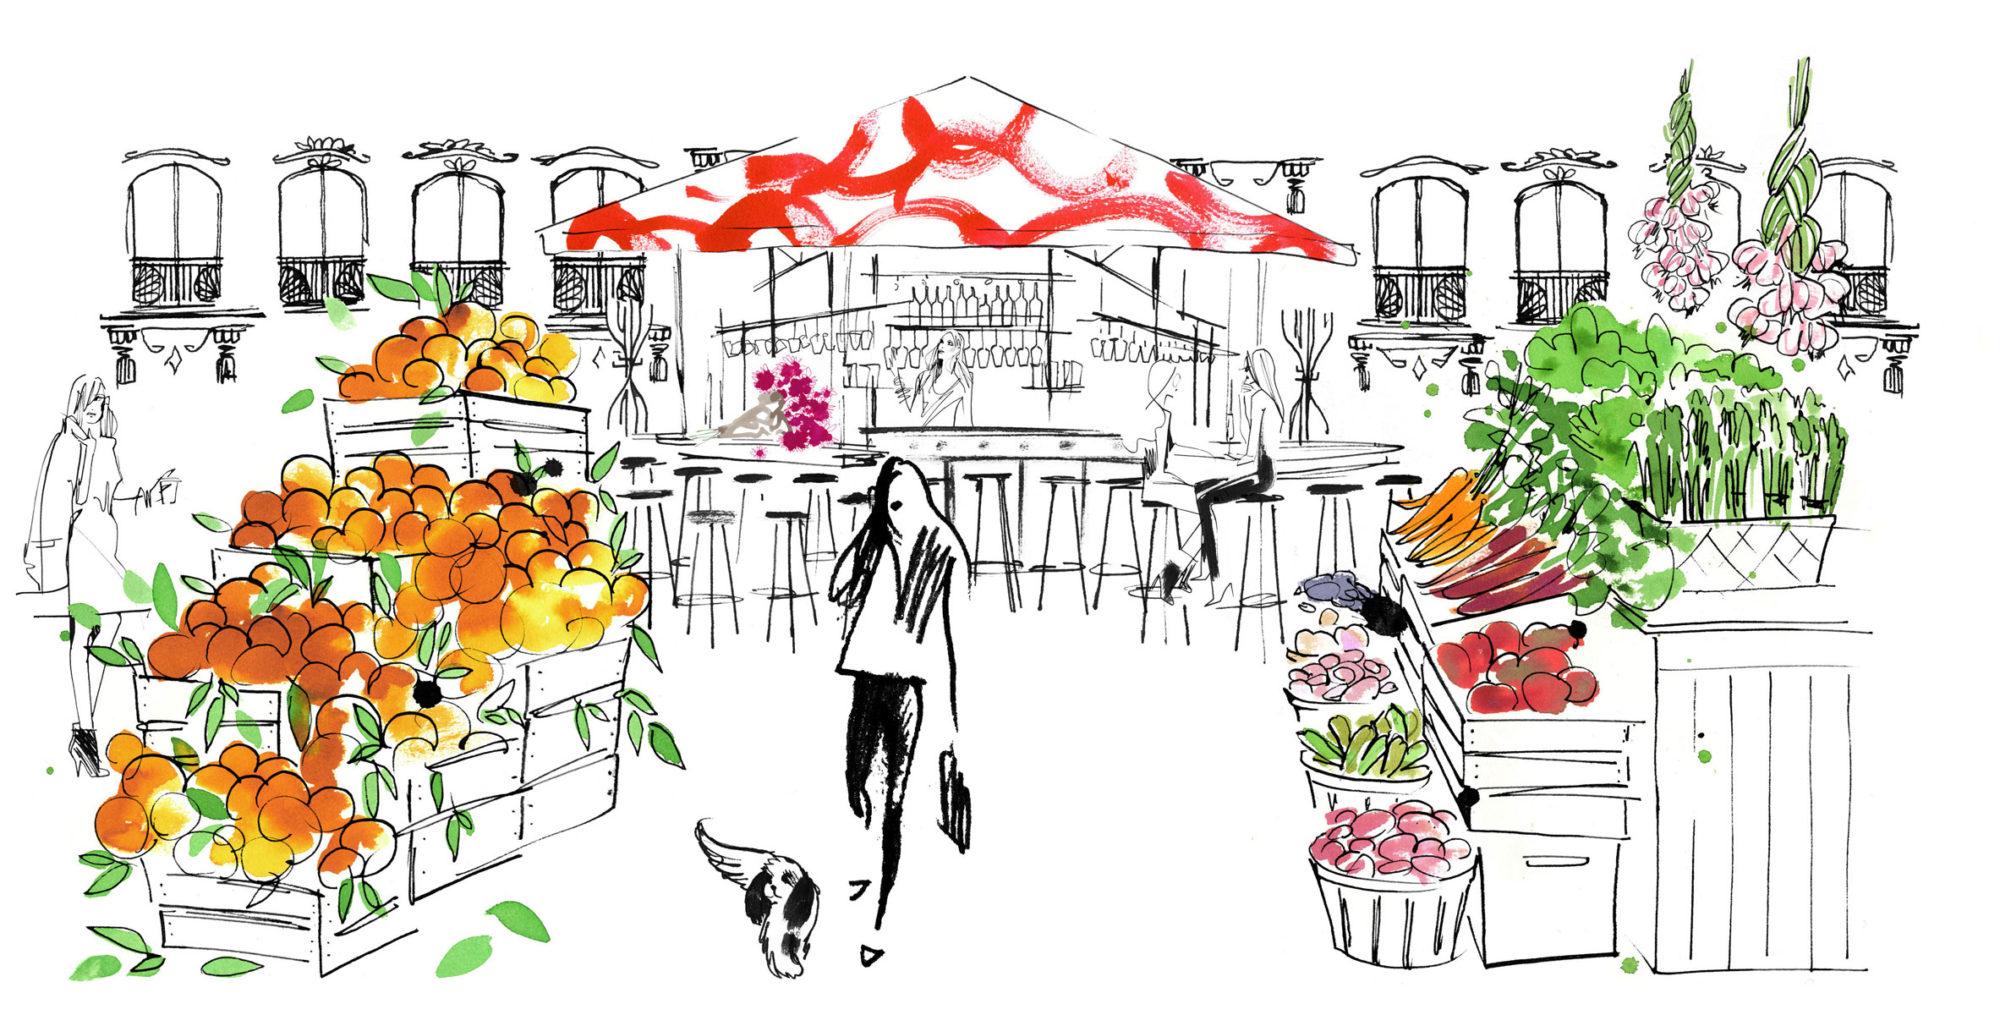 Lovisa-Burfitt-illustration-Sturekvarteret-Greenmarket-Sturegallerian_00